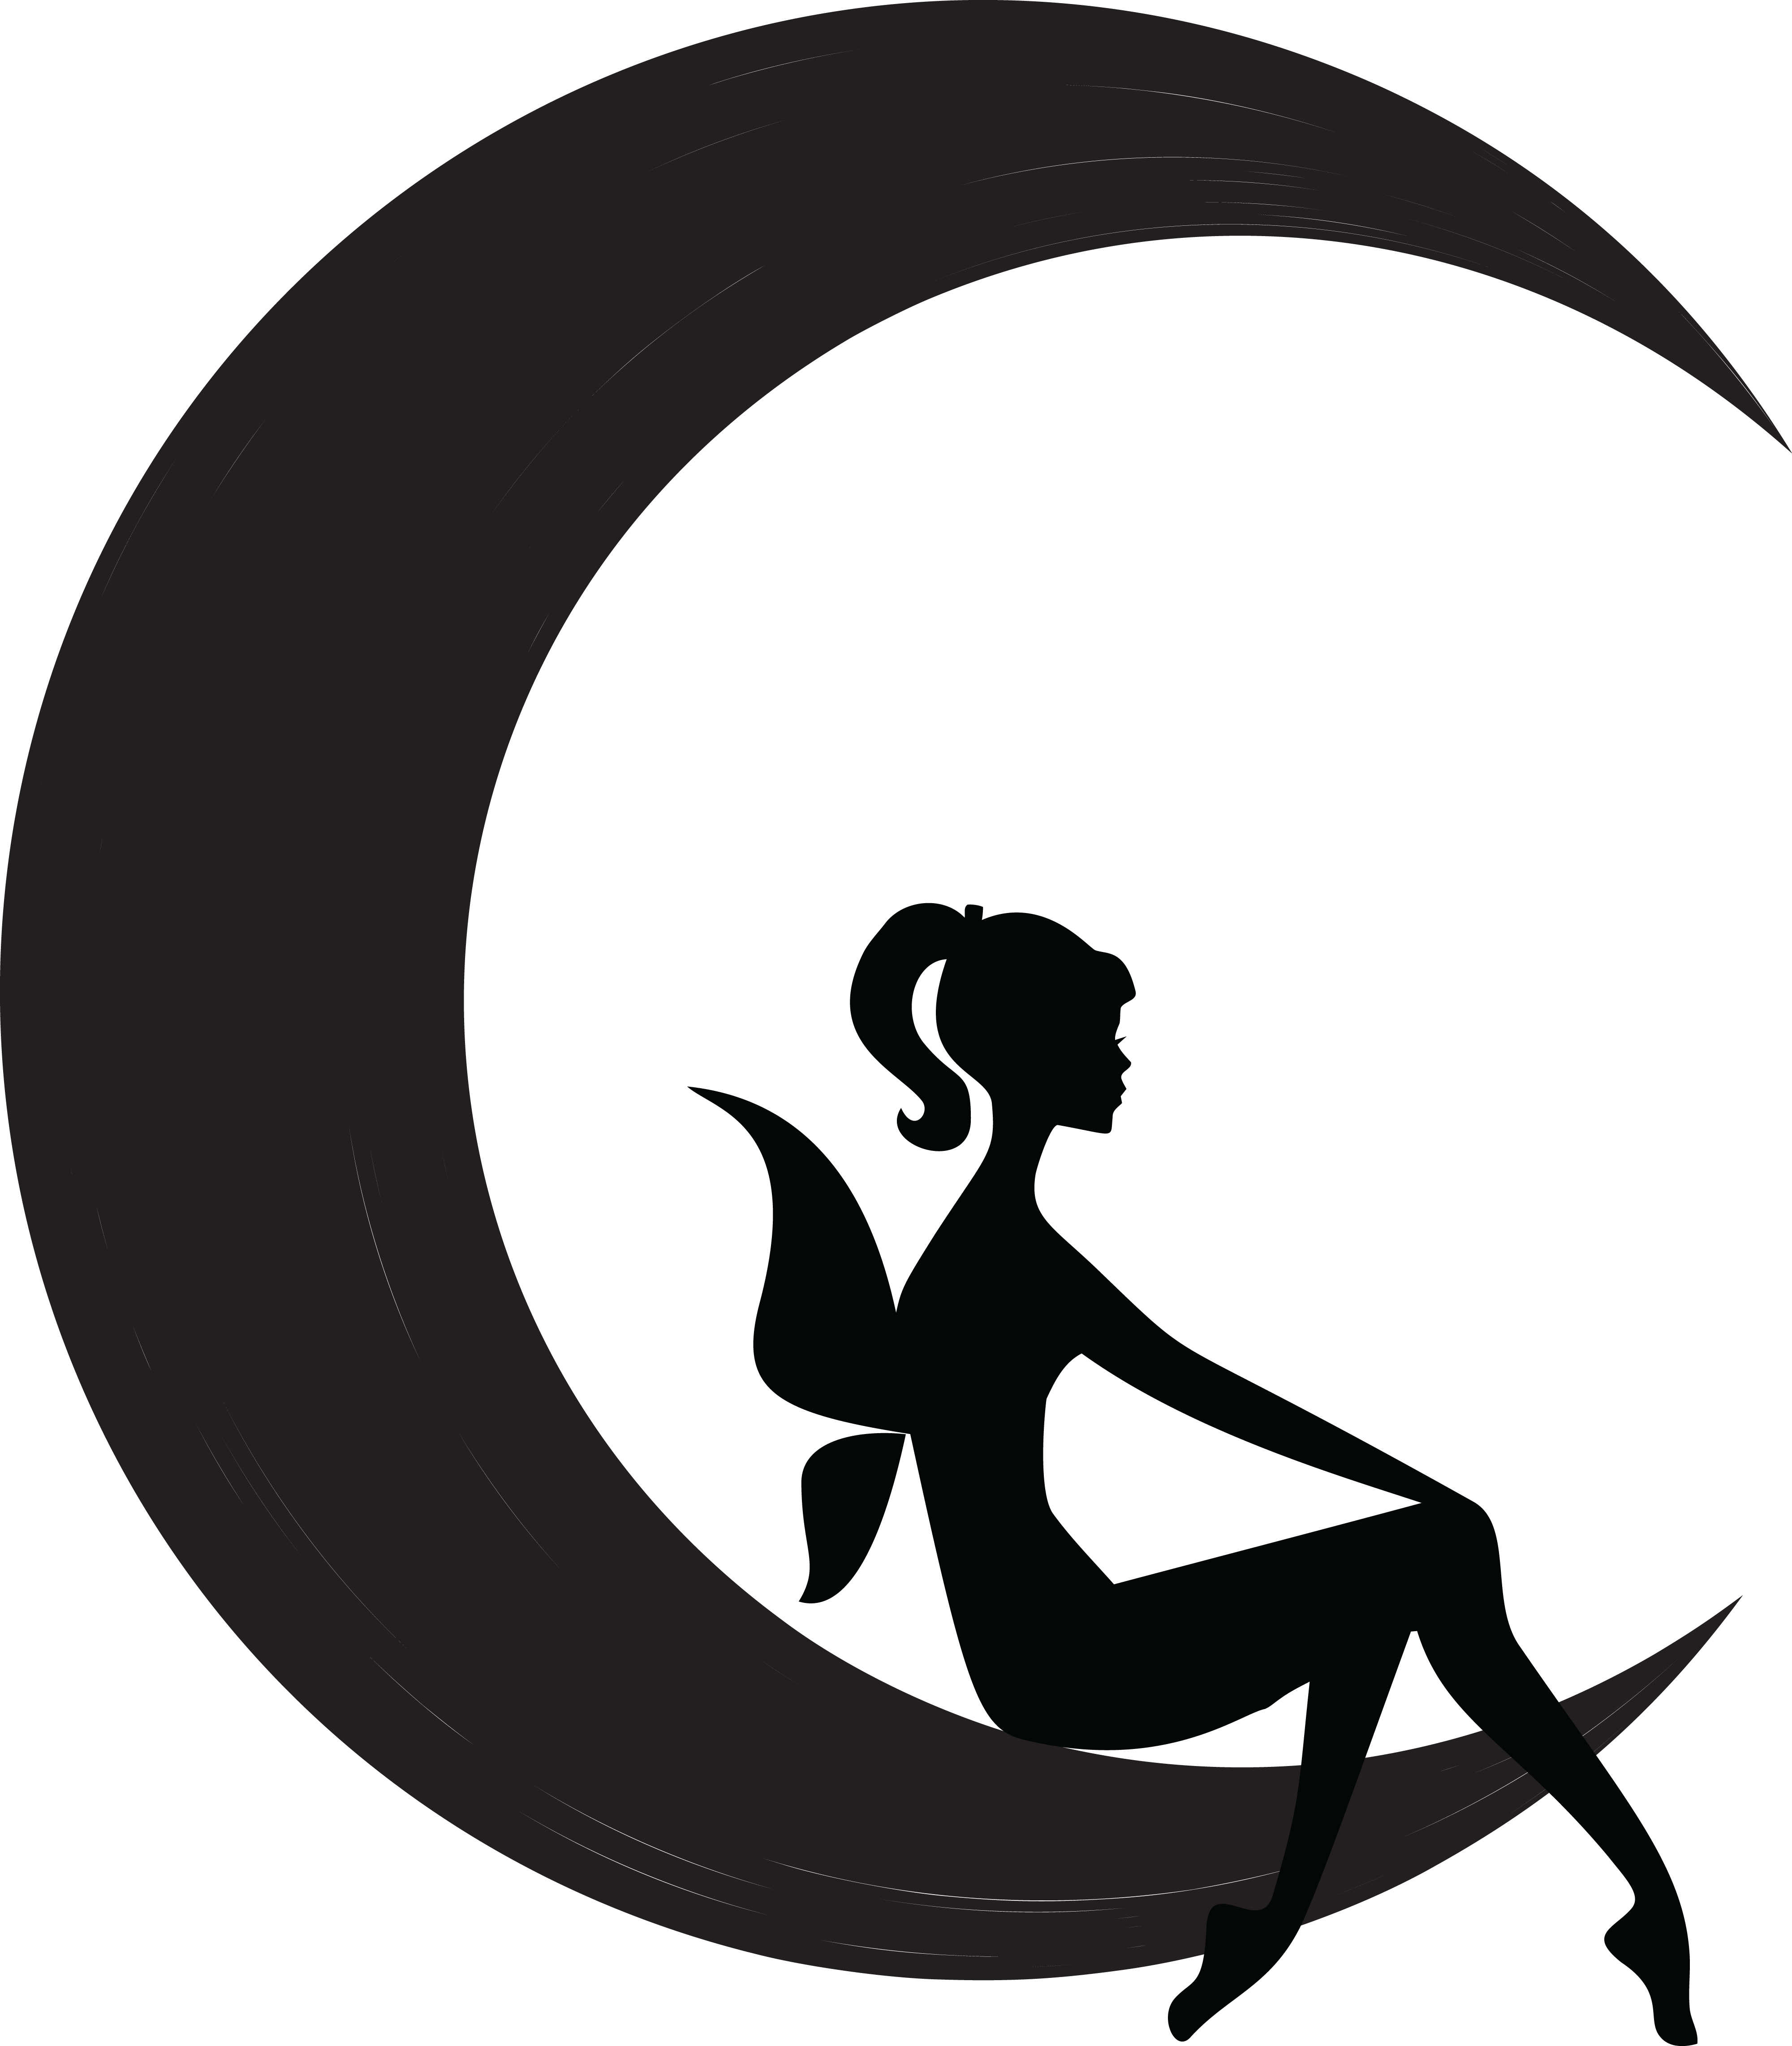 Fairies clipart outline. Fairy moon silhouette flower